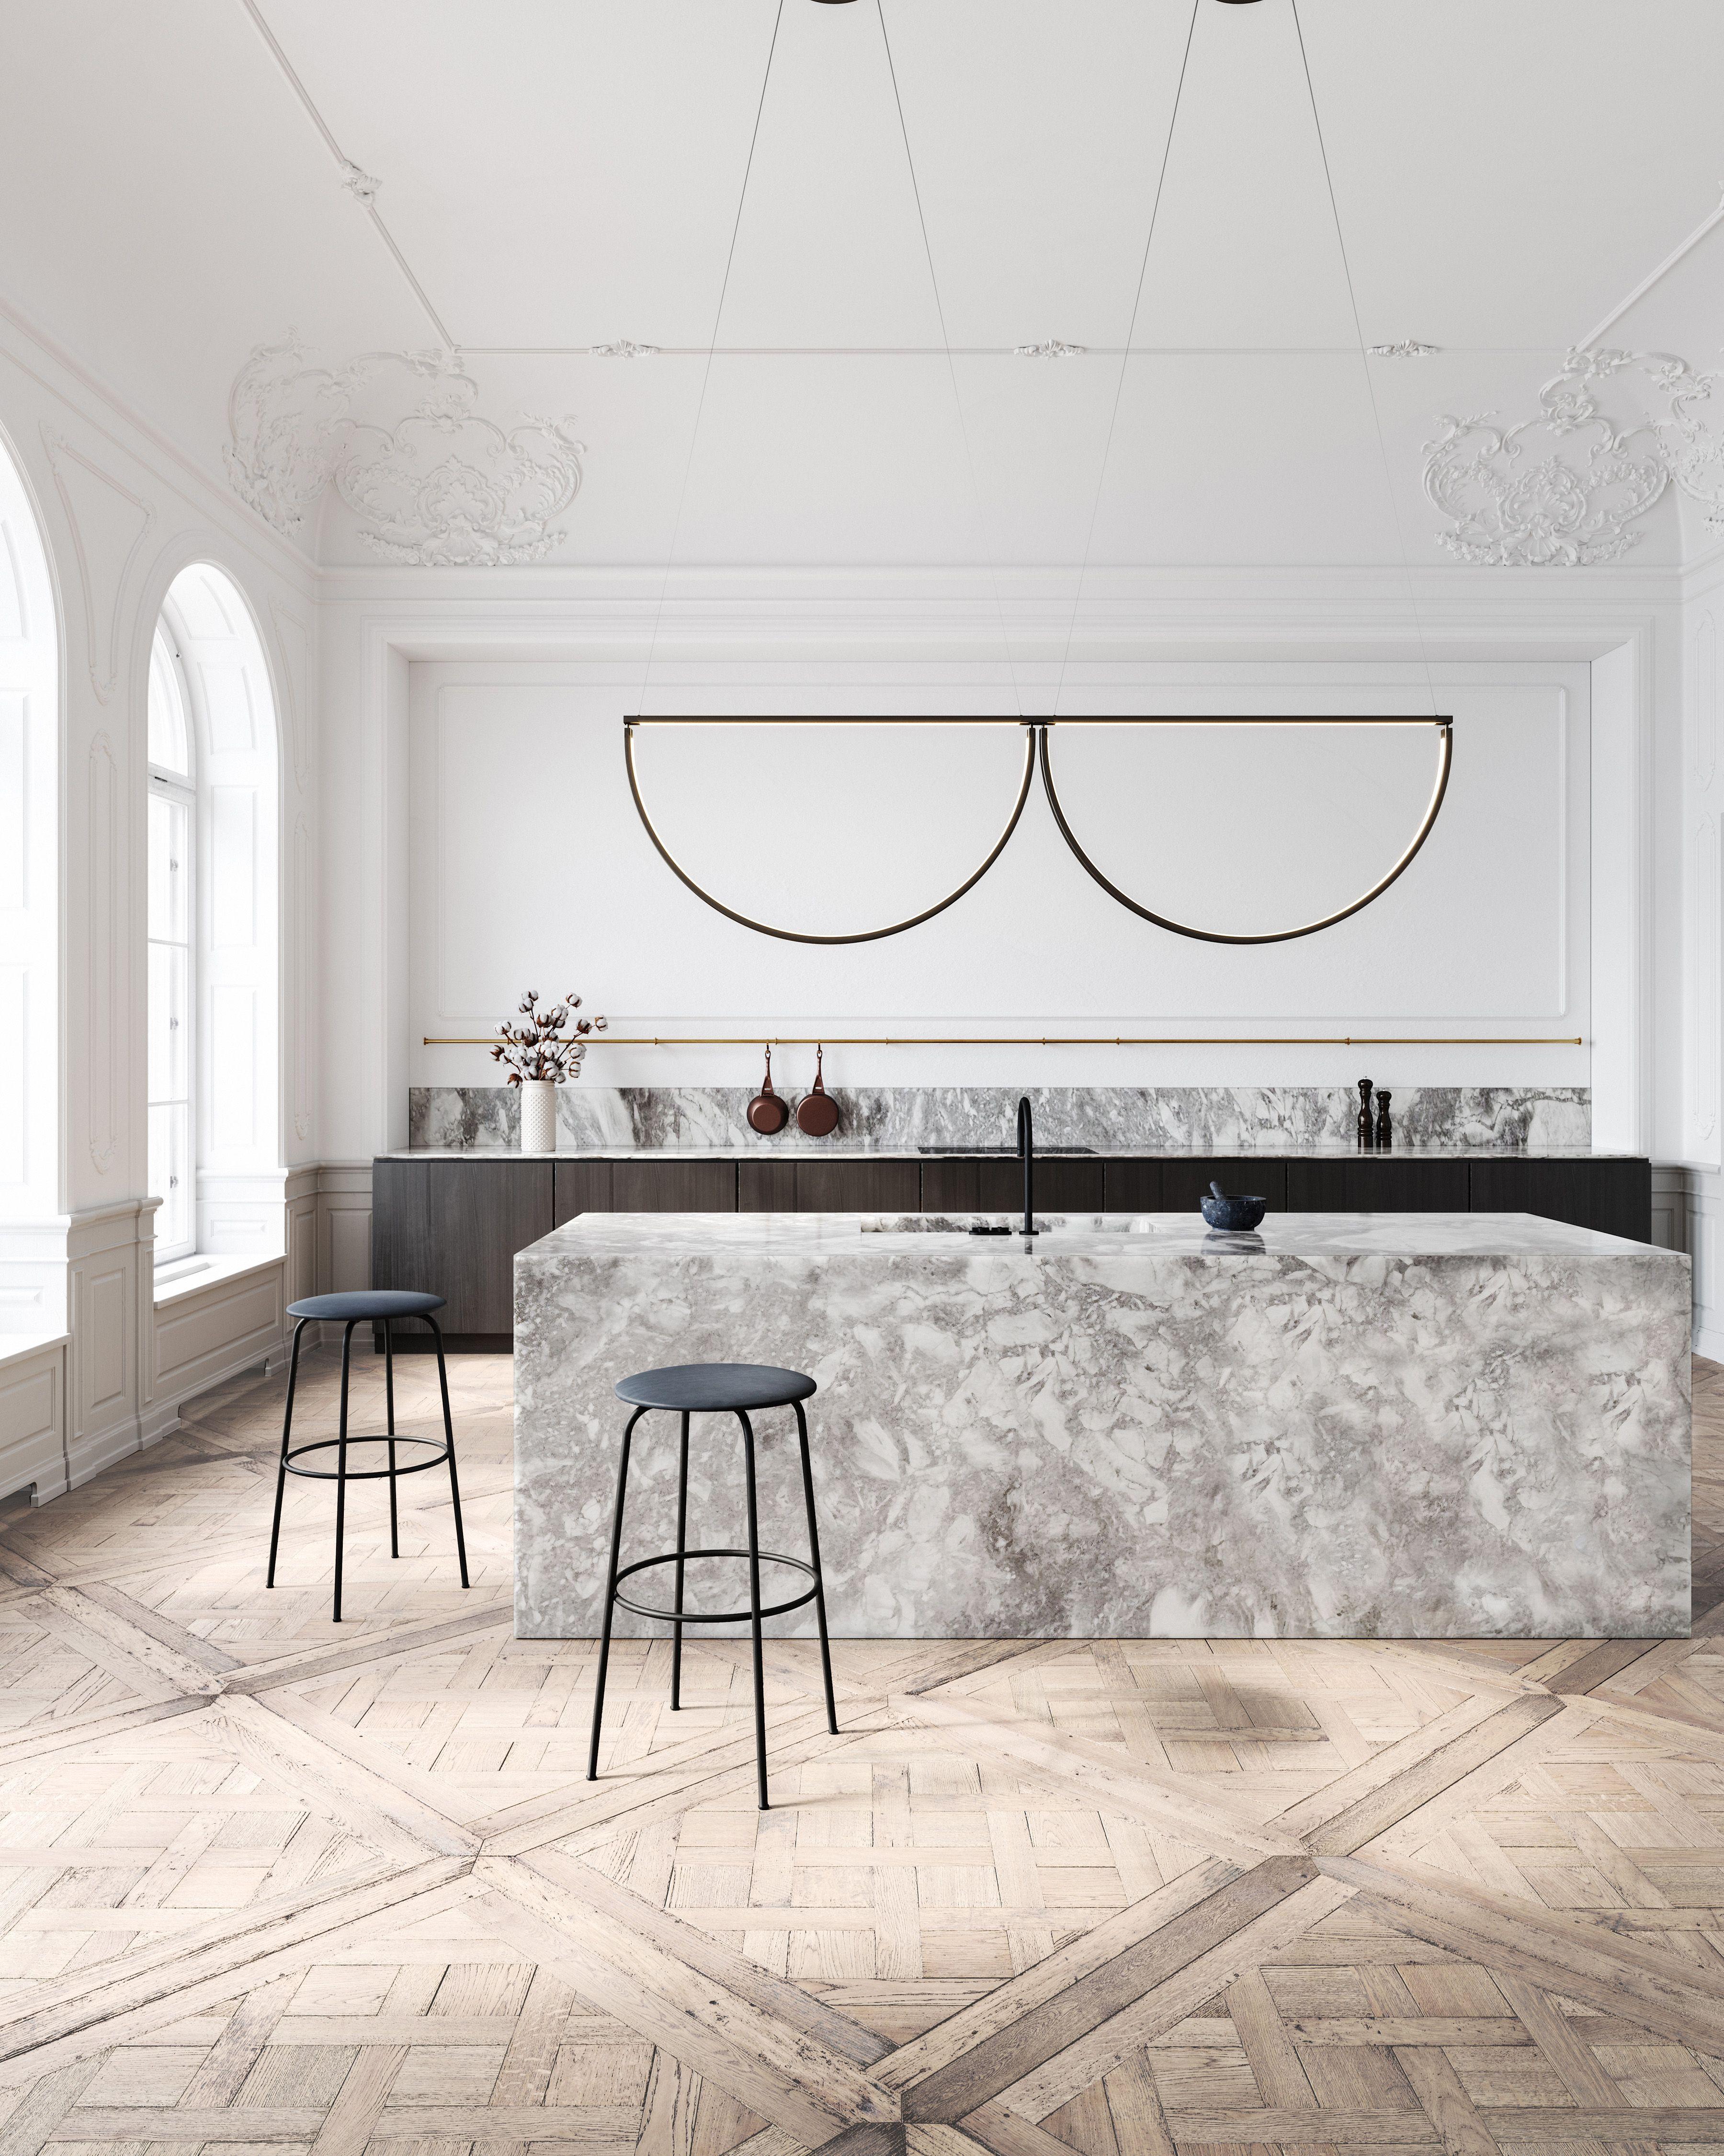 Chord Convoy Pendant and Kitchen design by AlexAllen Studio